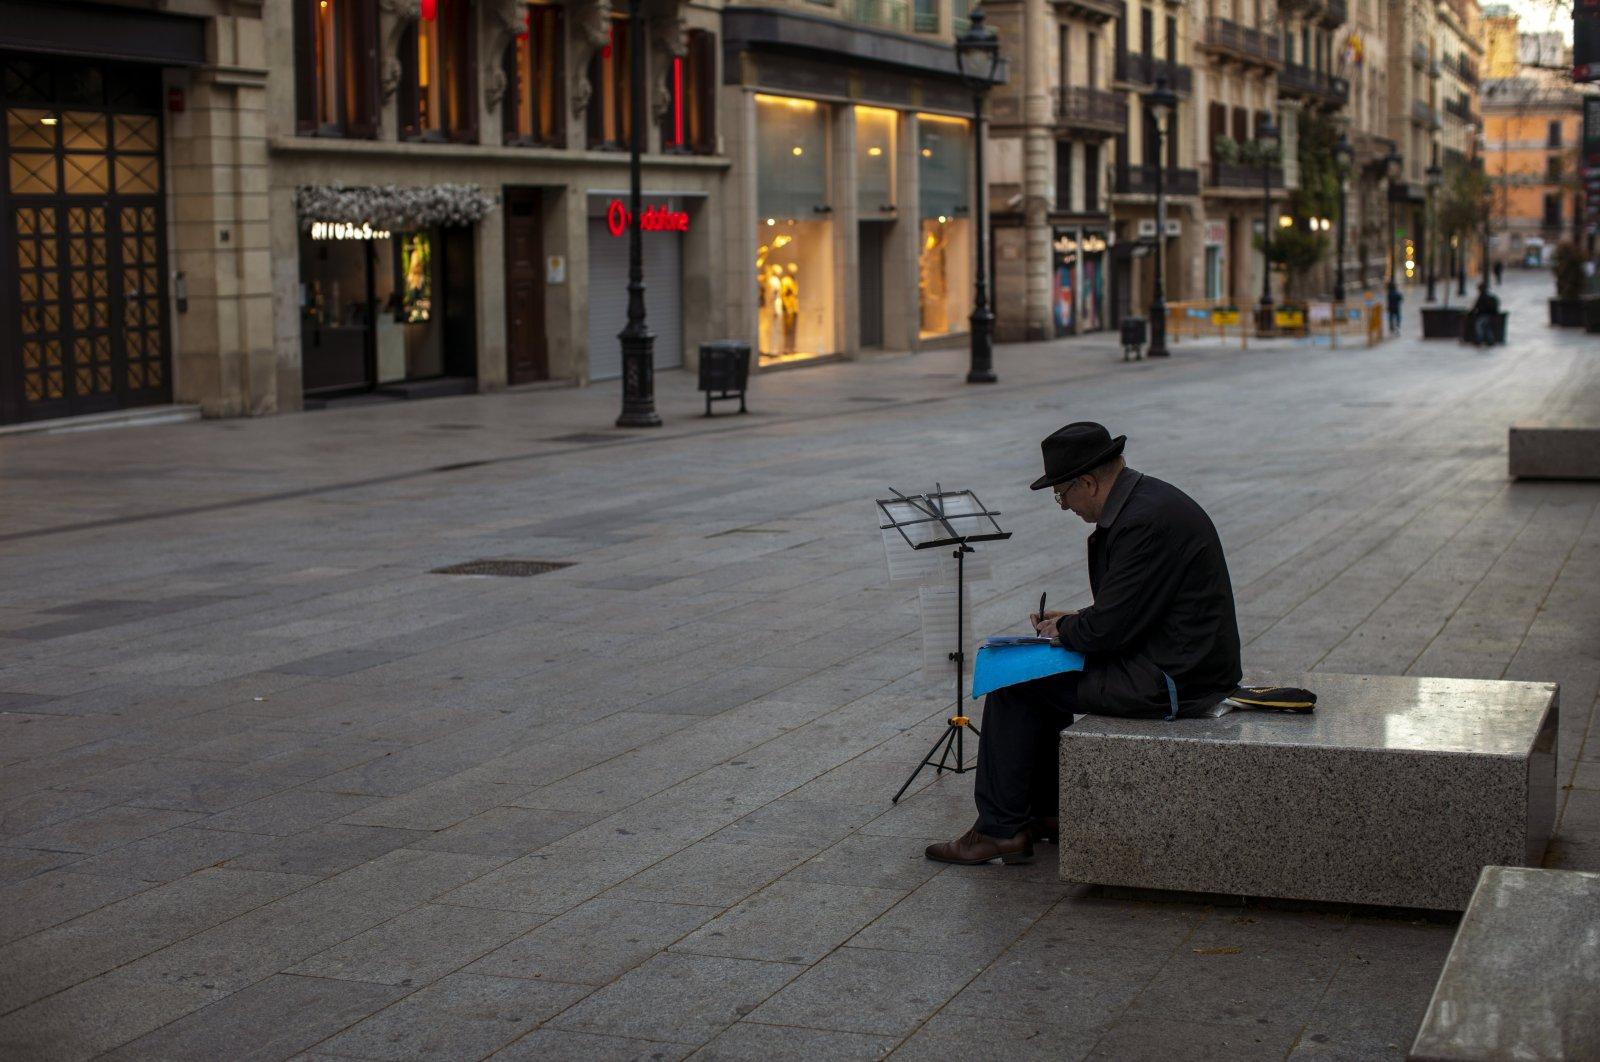 A man sits in an empty street in Barcelona, Spain, March 15, 2020. (AP Photo)